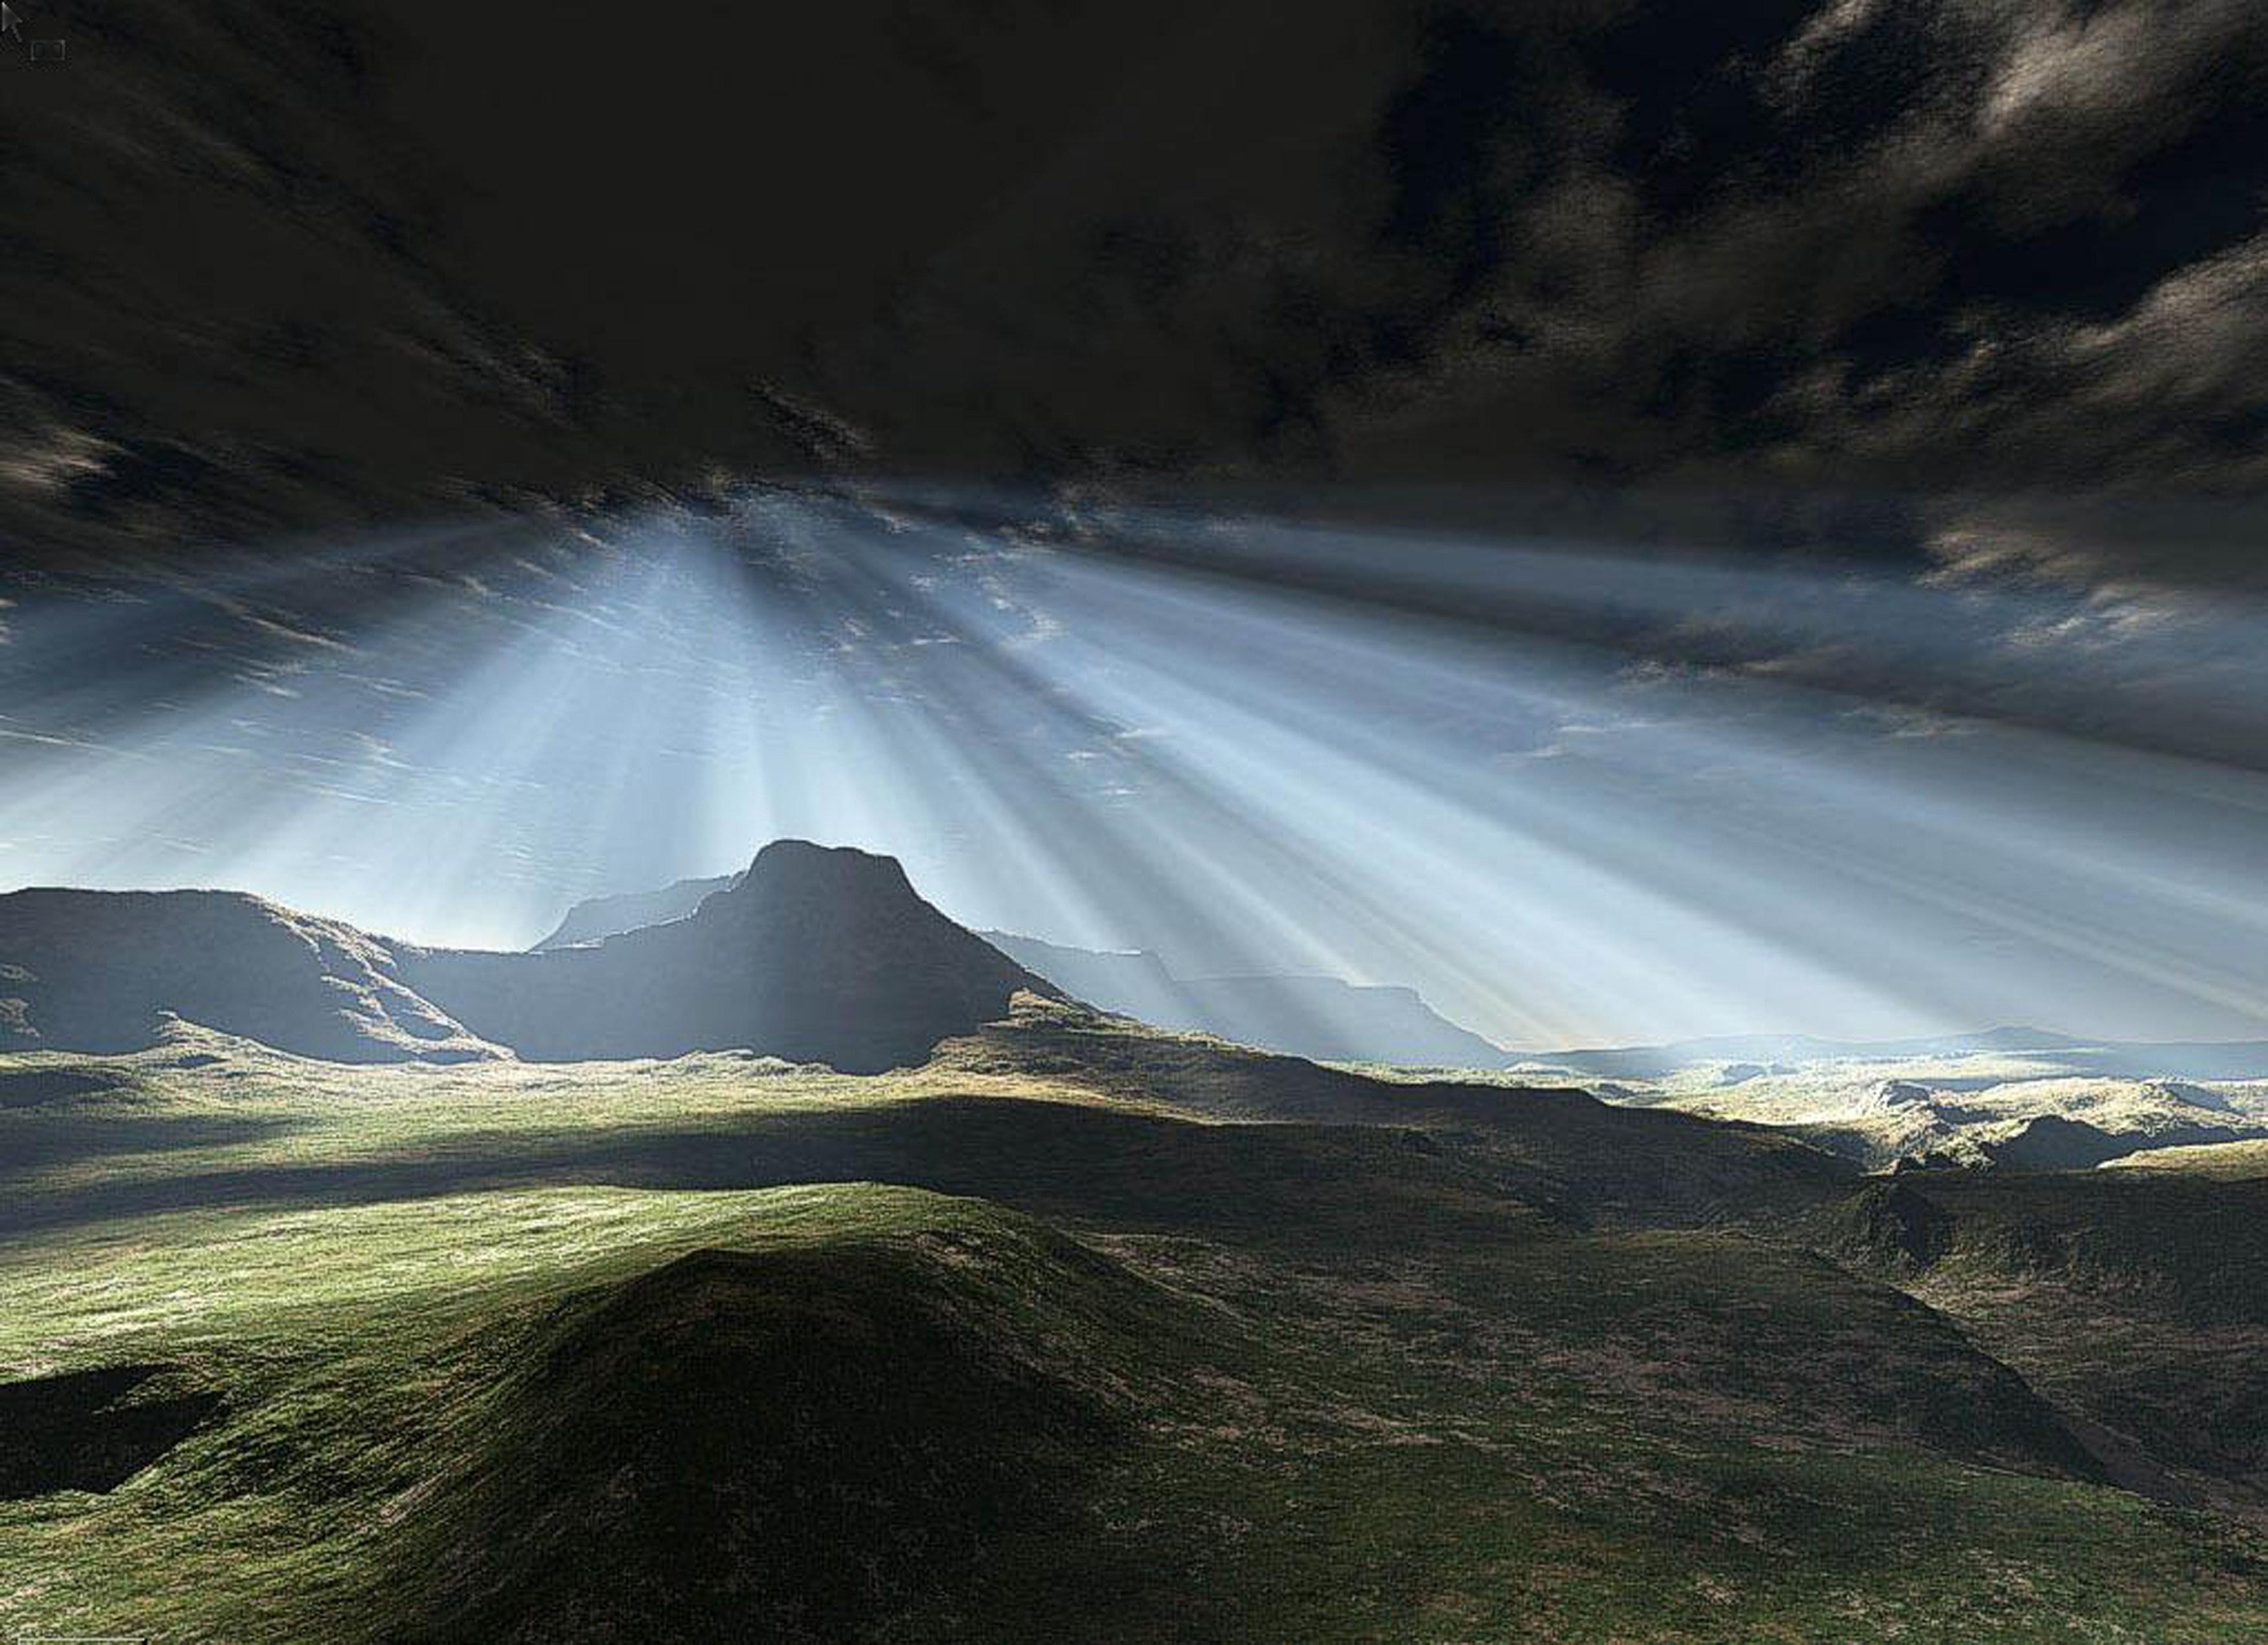 Image rayons des cieux - raycie